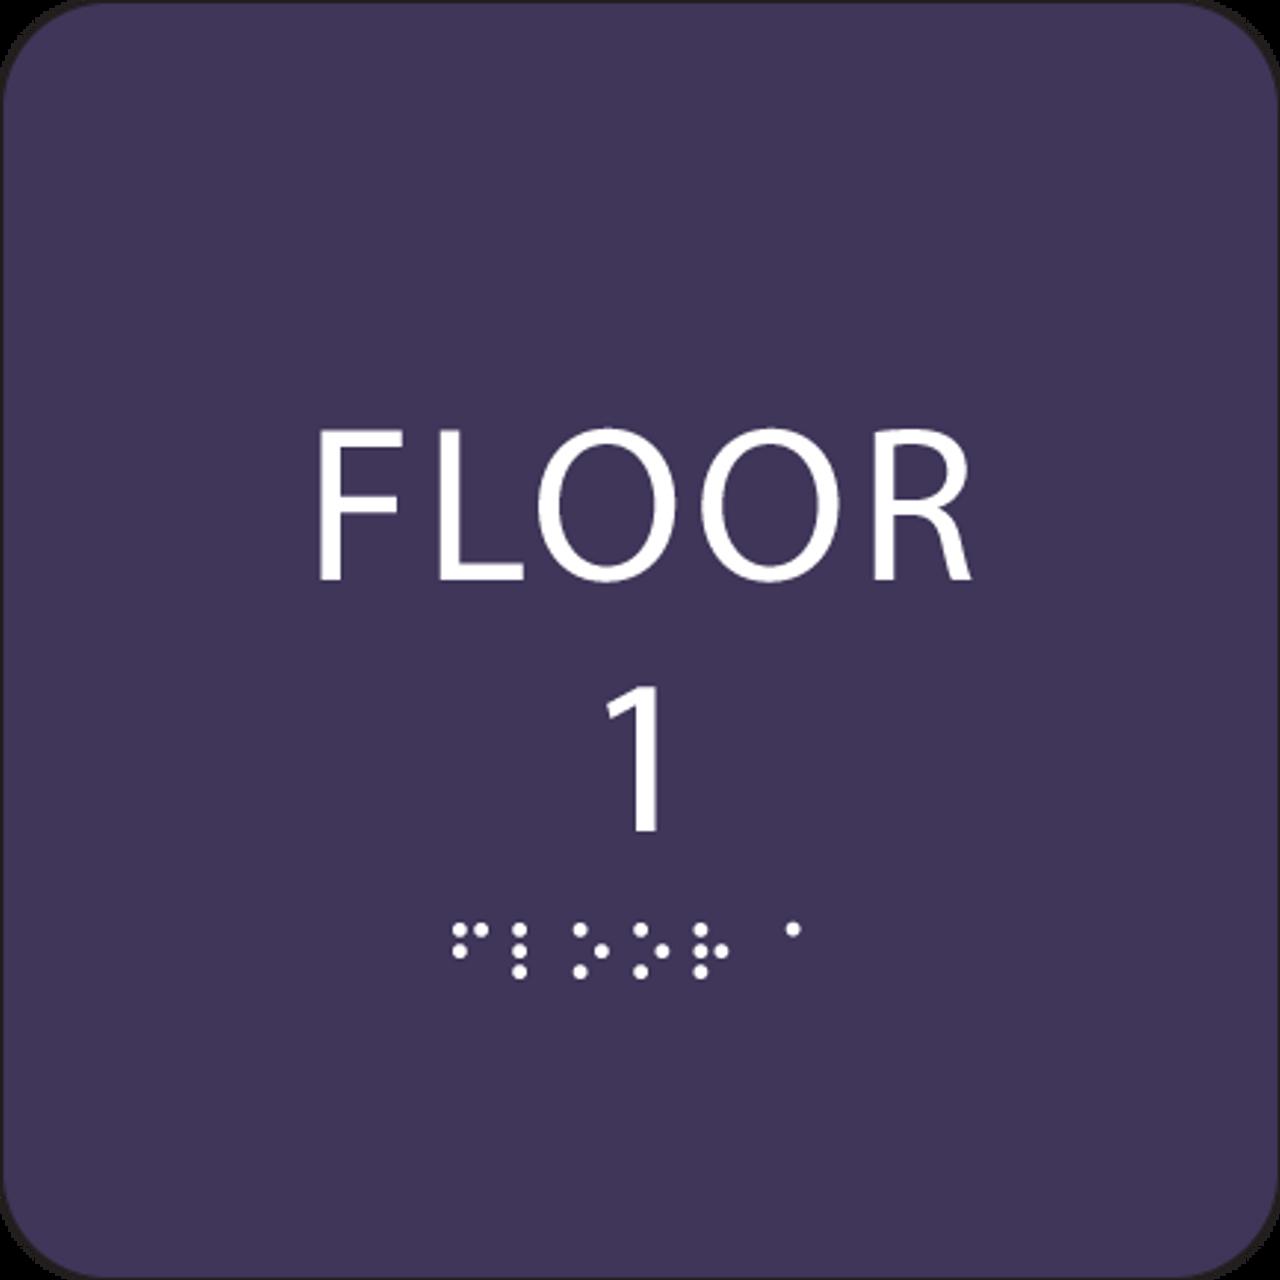 Purple Floor 1 Identification Sign